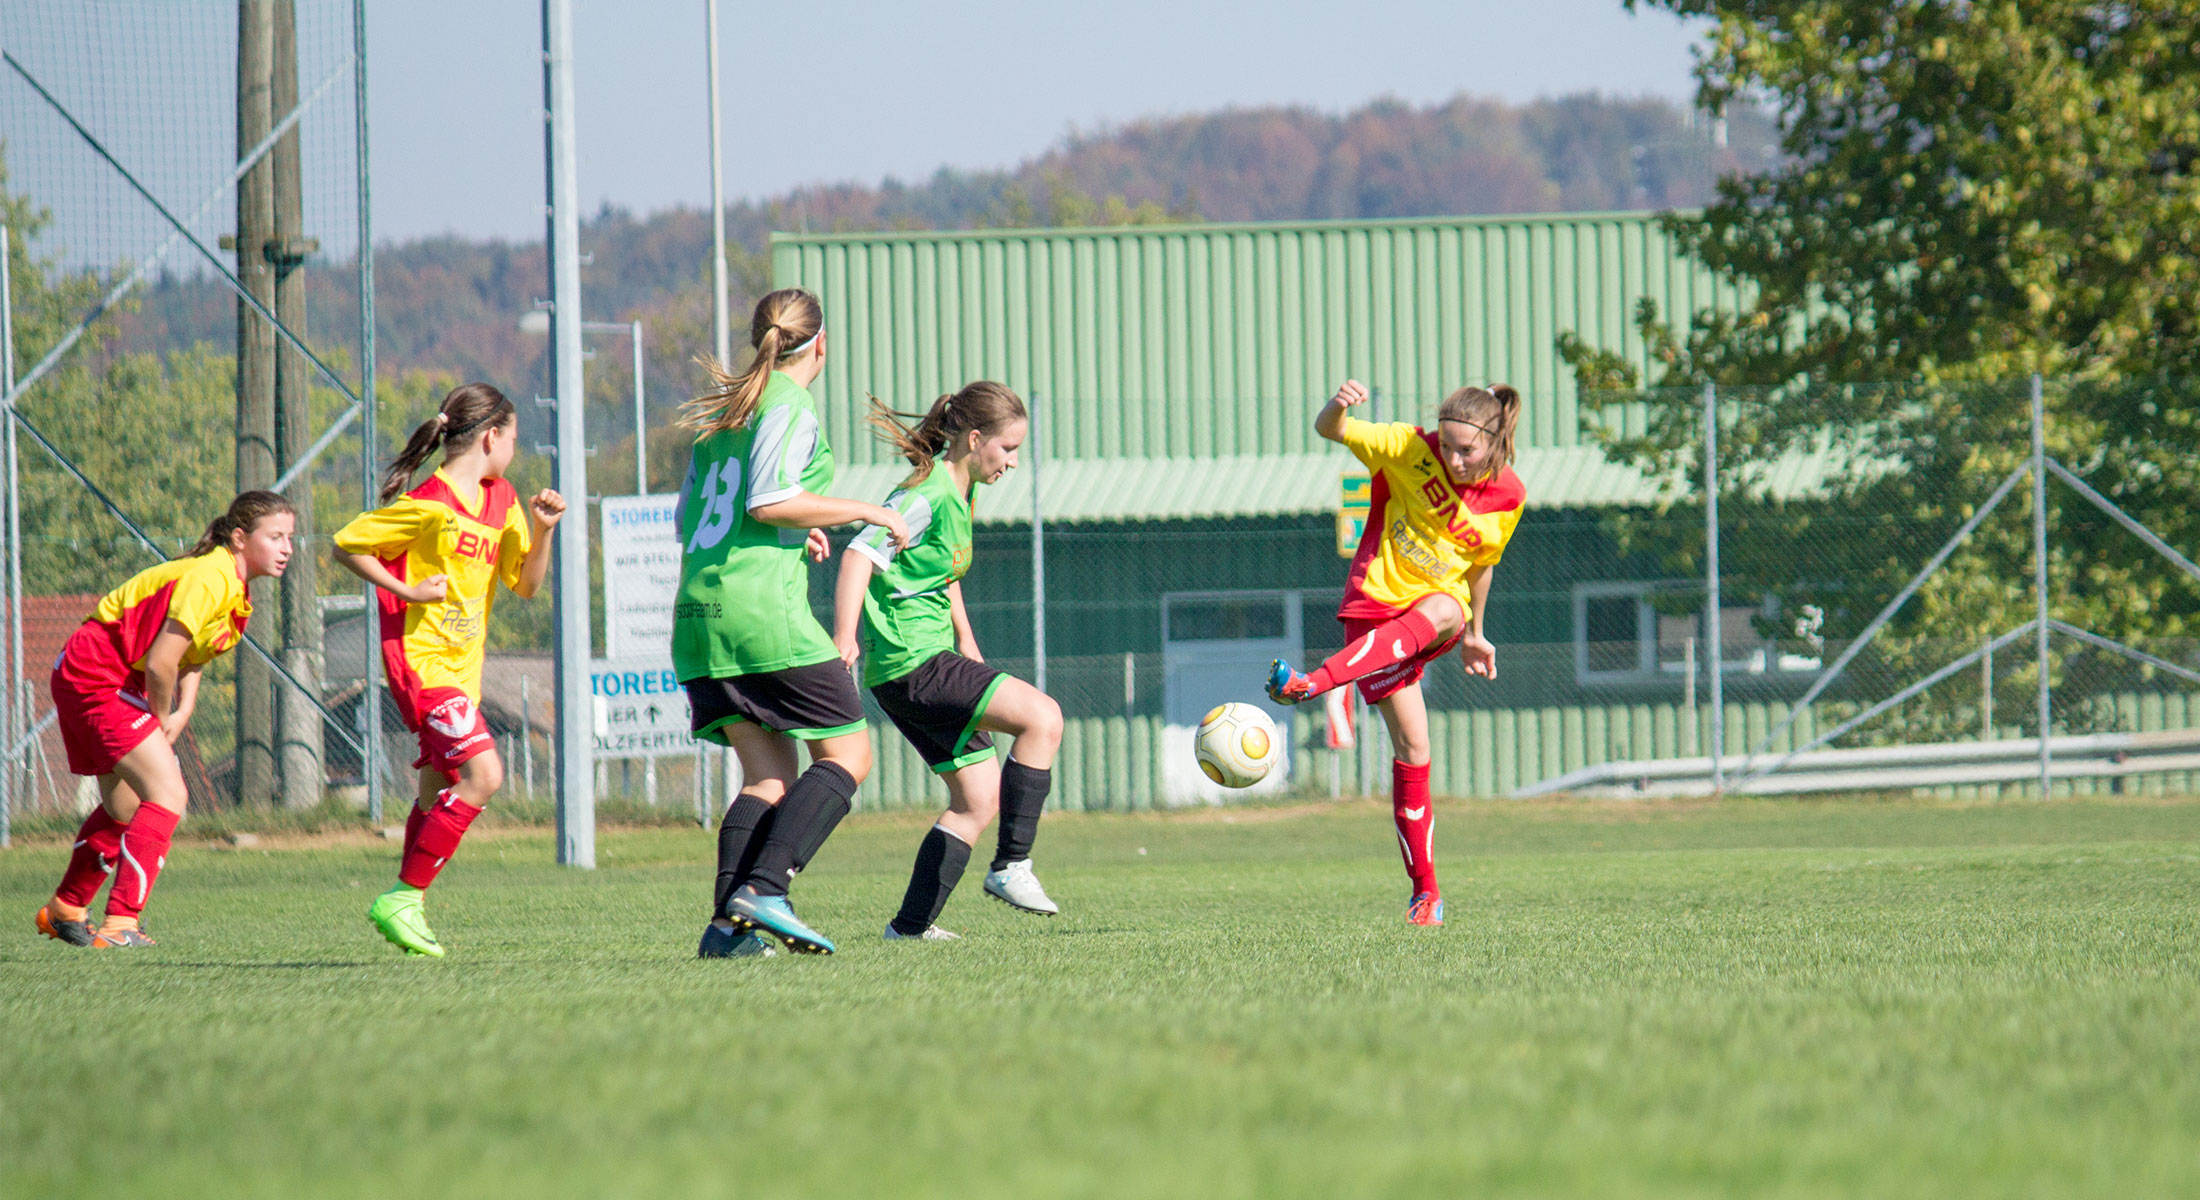 MHL: Saisonfinale klar verloren!